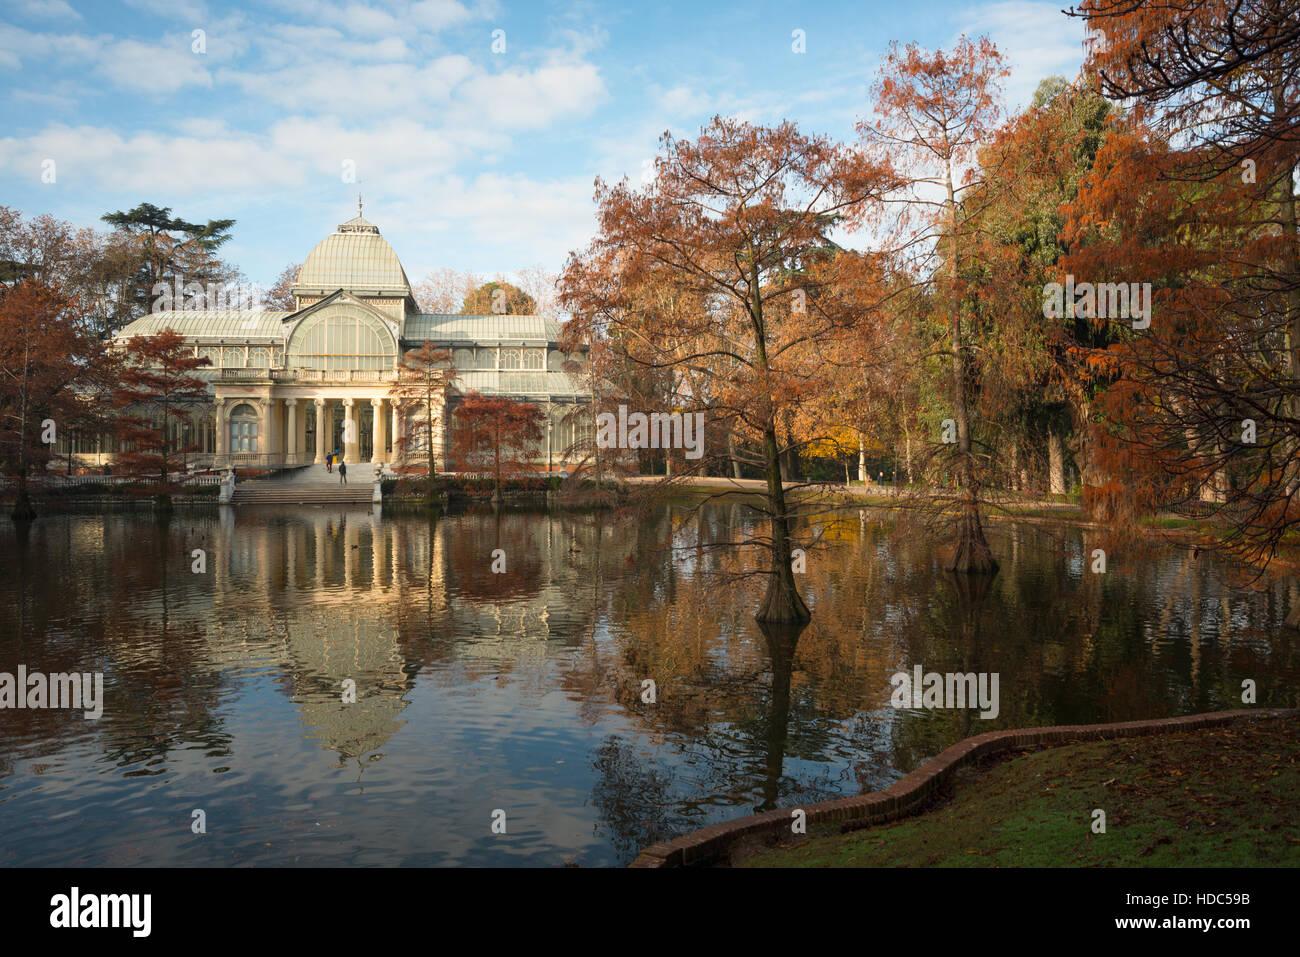 Crystal Palace in the Buen Retiro Park, Madrid Spain - Stock Image